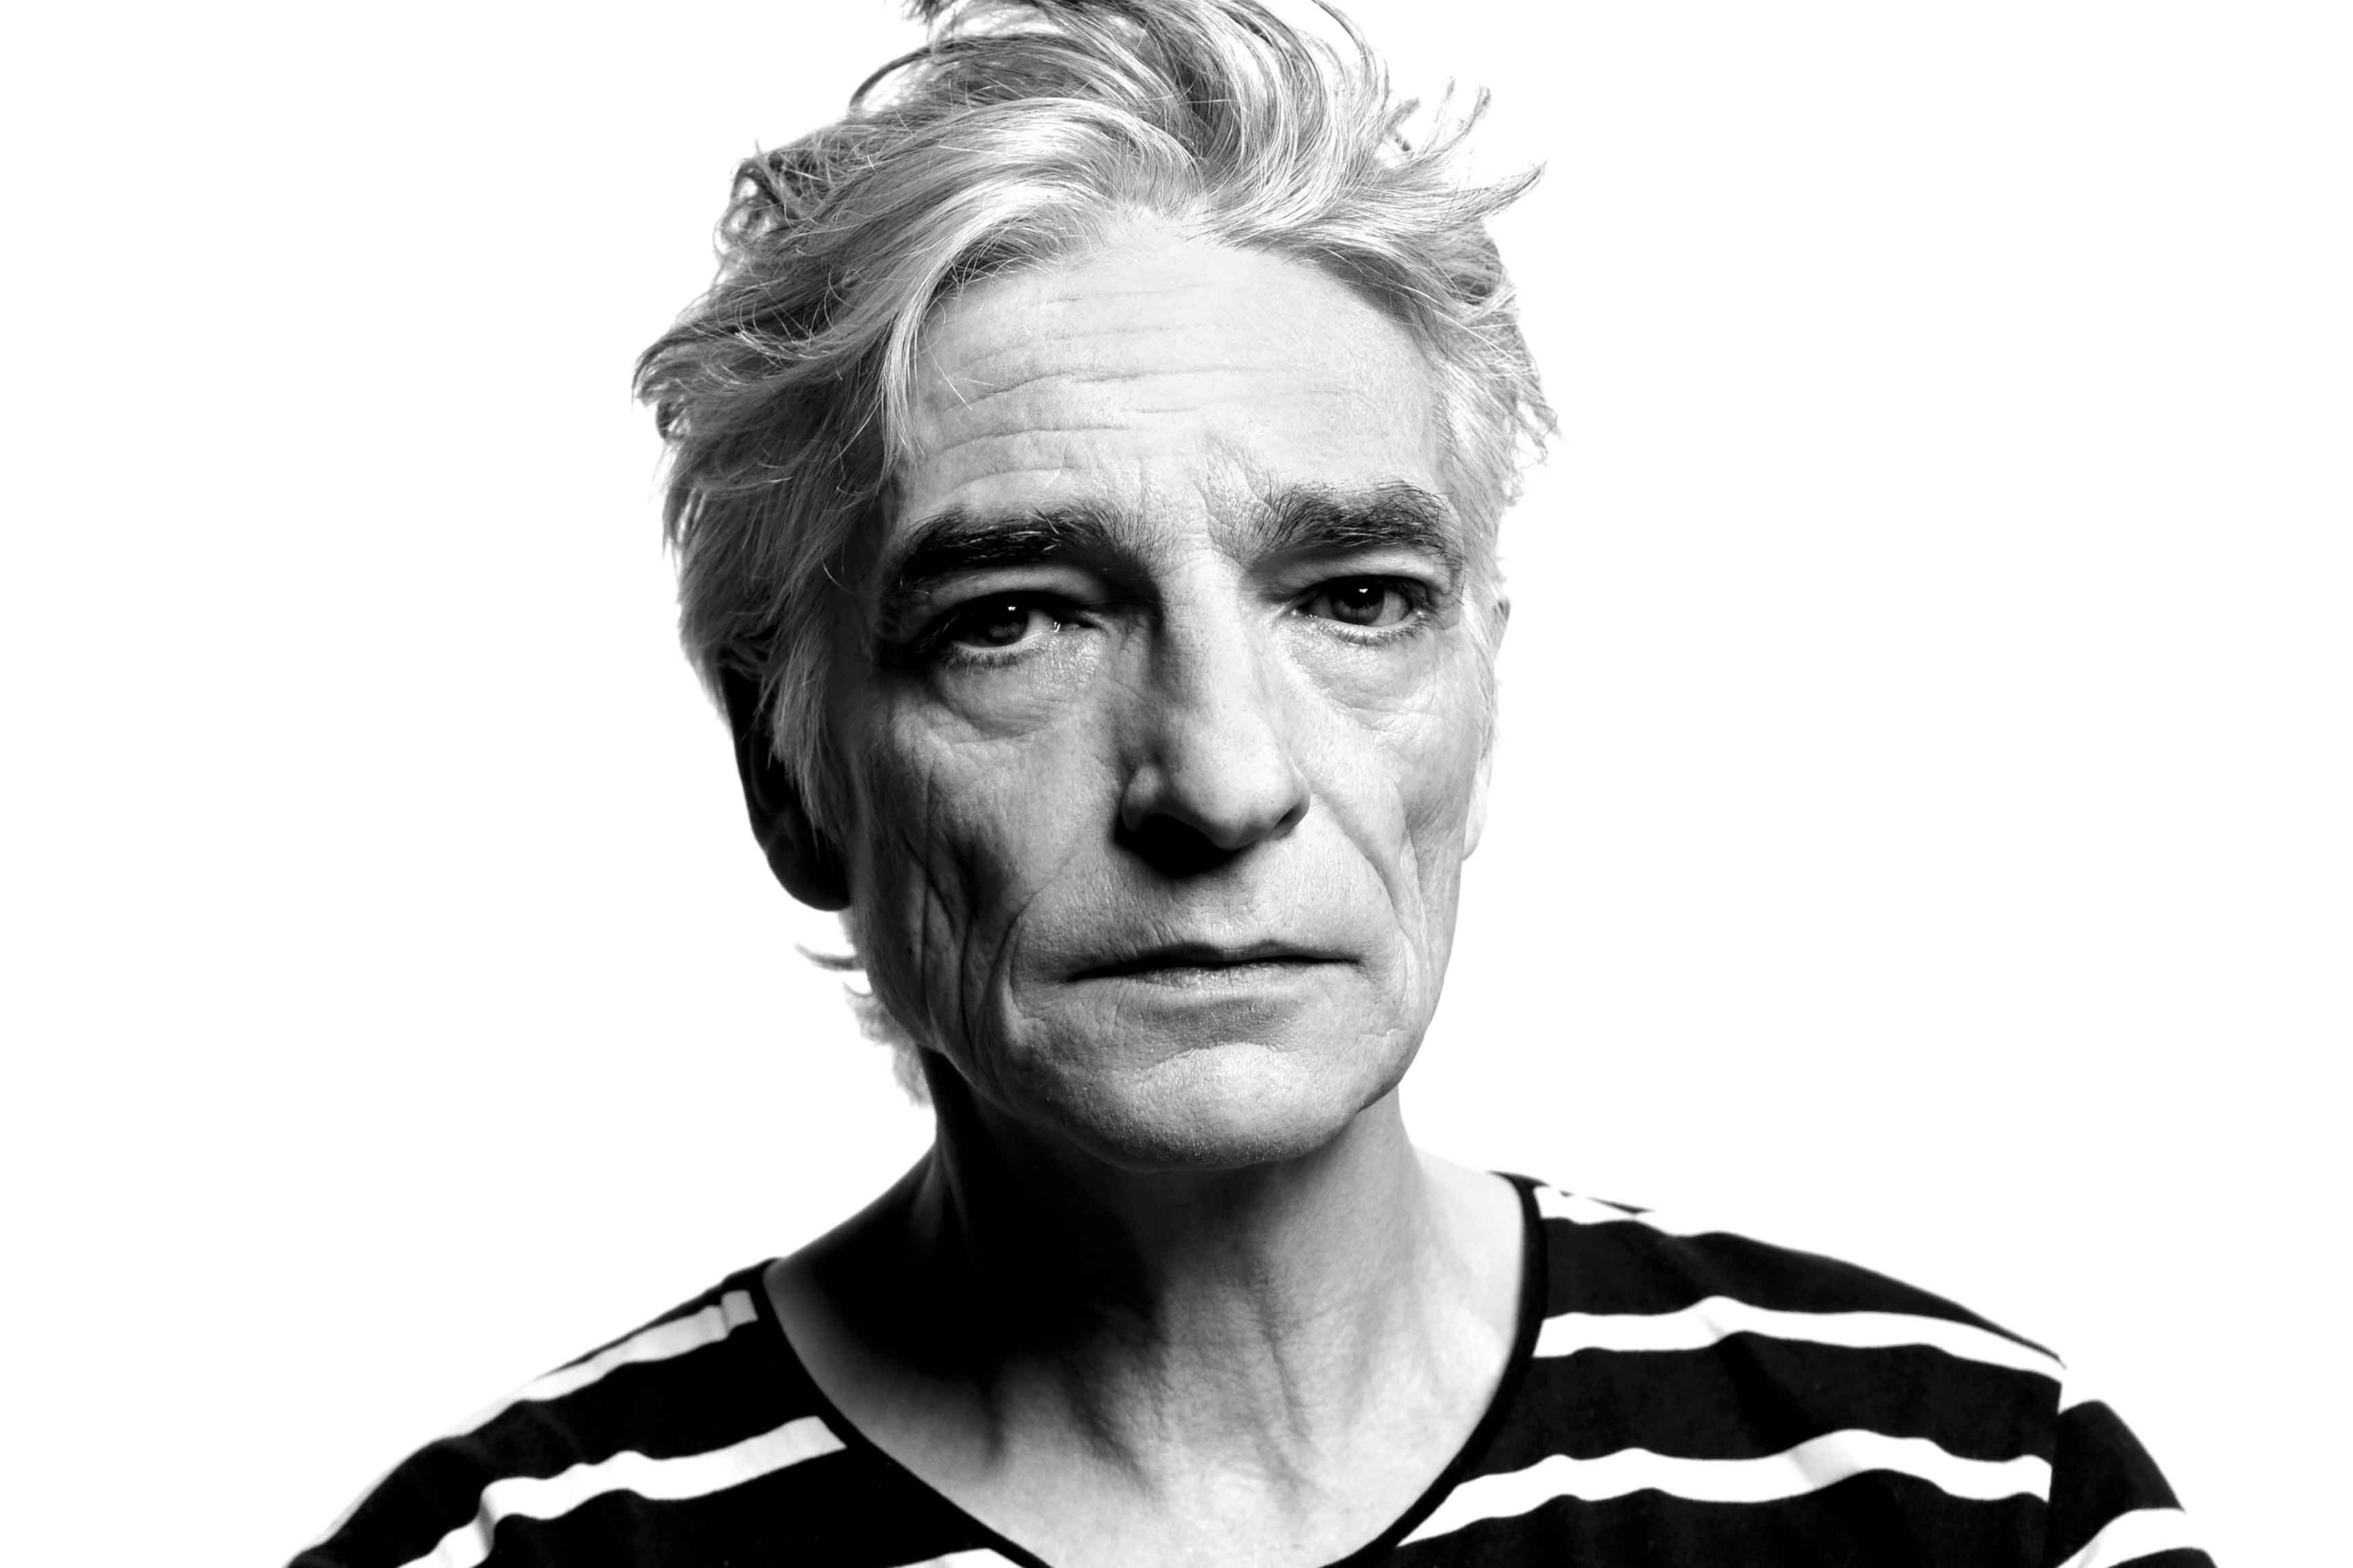 Philippe Pascal, 2014 ©Étienne Daho